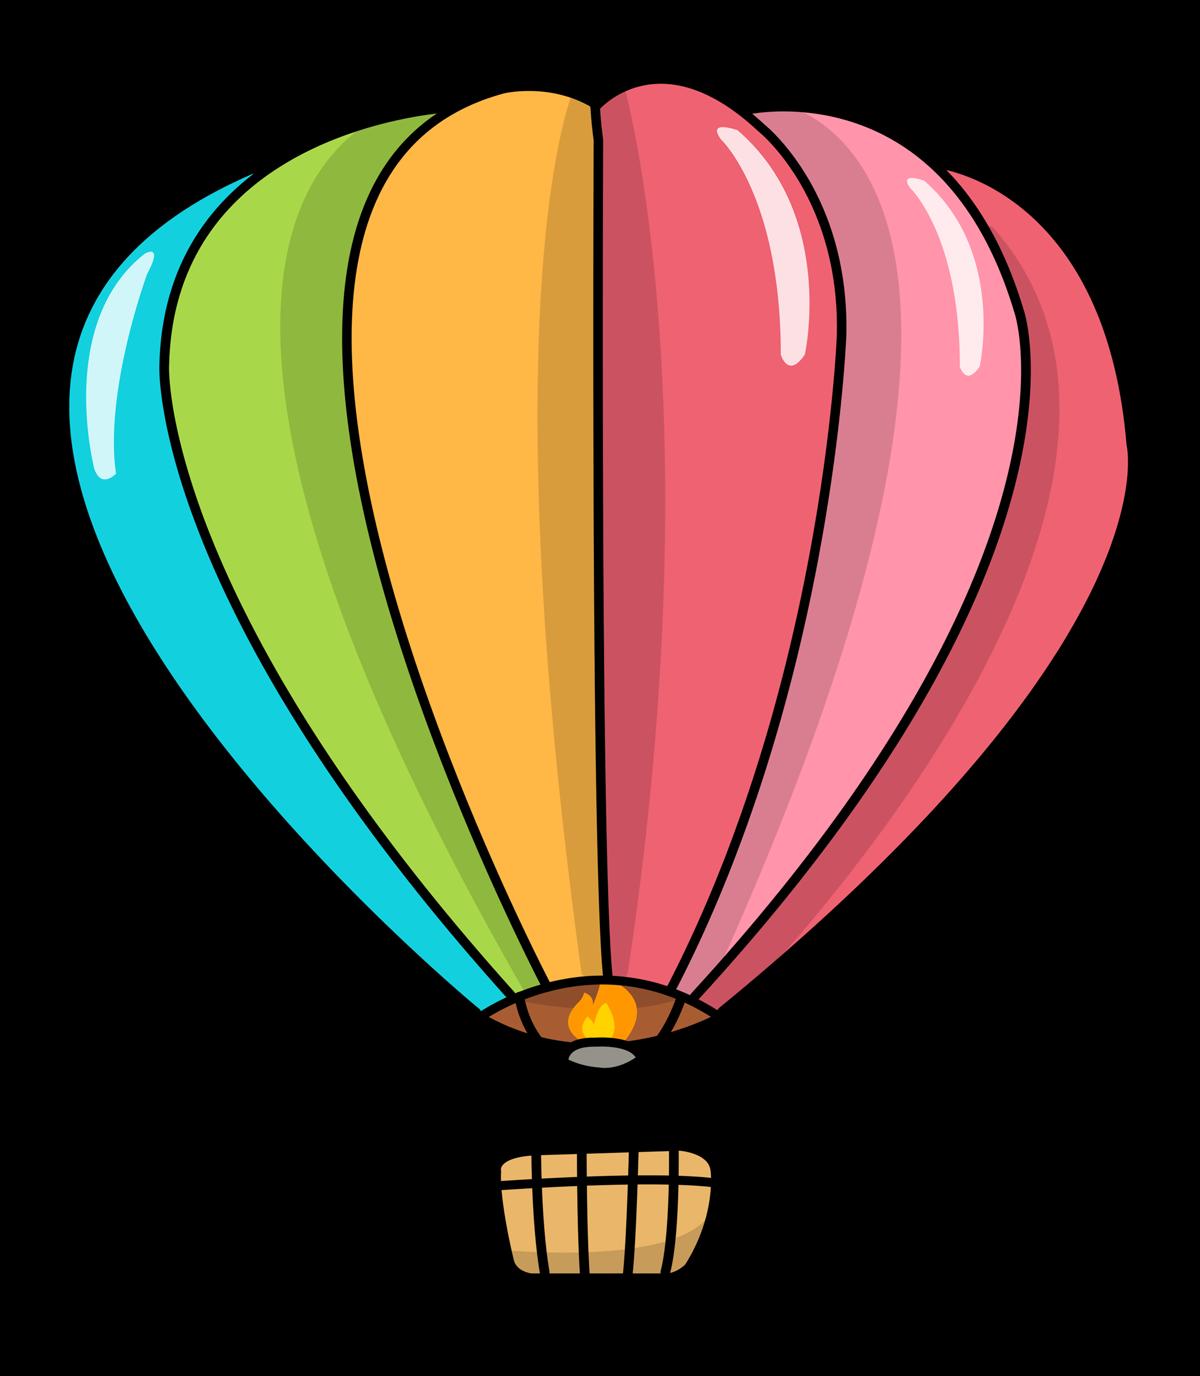 Hot Air Balloon Clip Art-Hot Air Balloon Clip Art-4